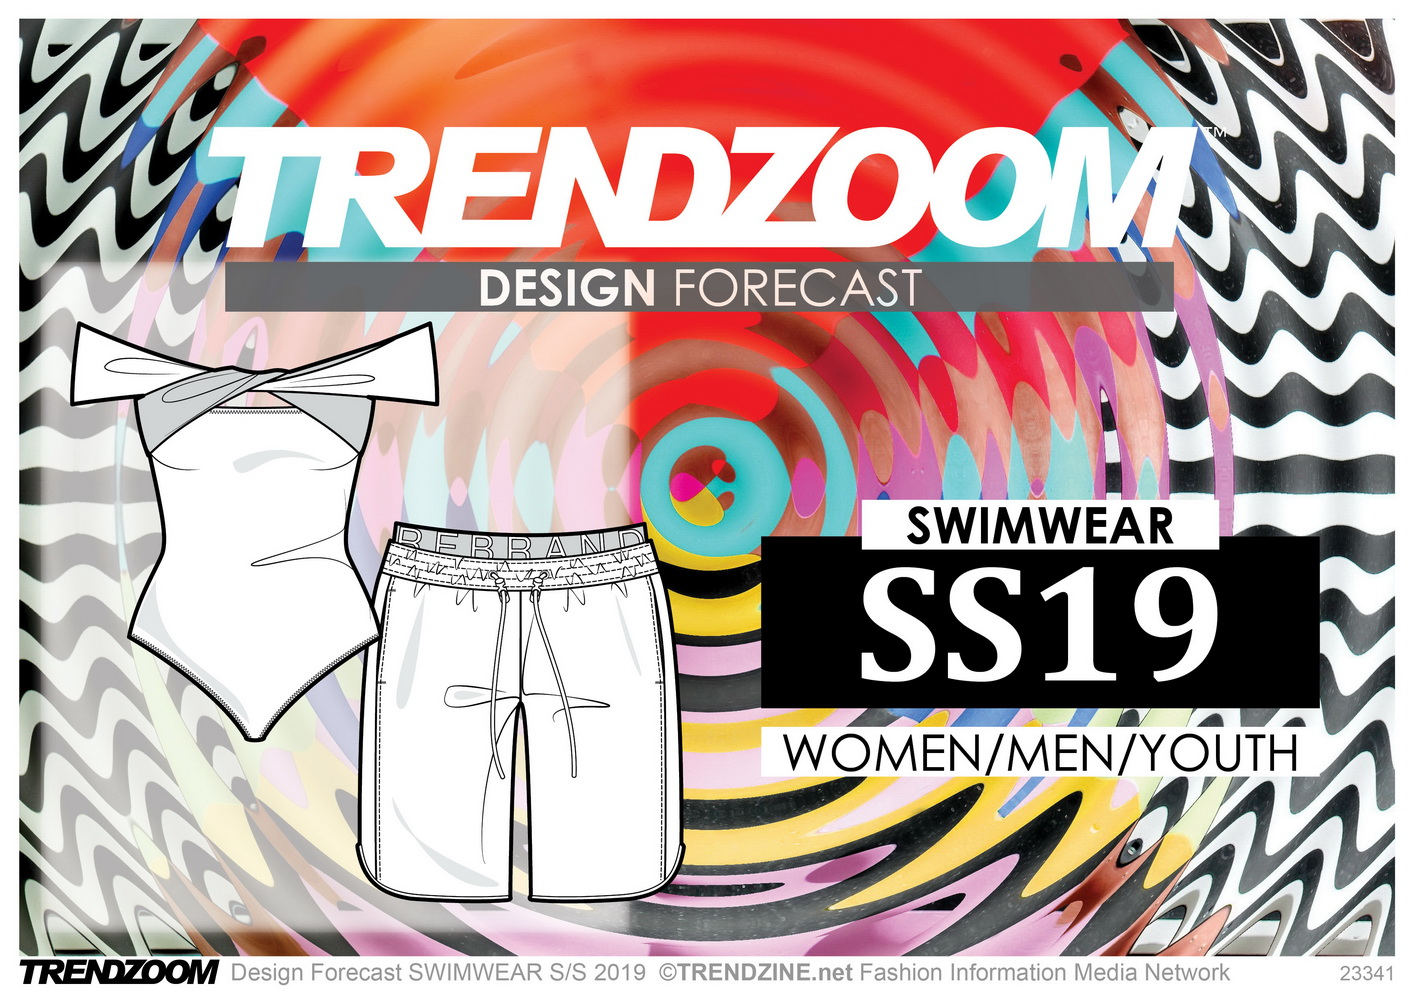 Trendzoom Design Forecast Women Men Youth Swimwear S S 2019